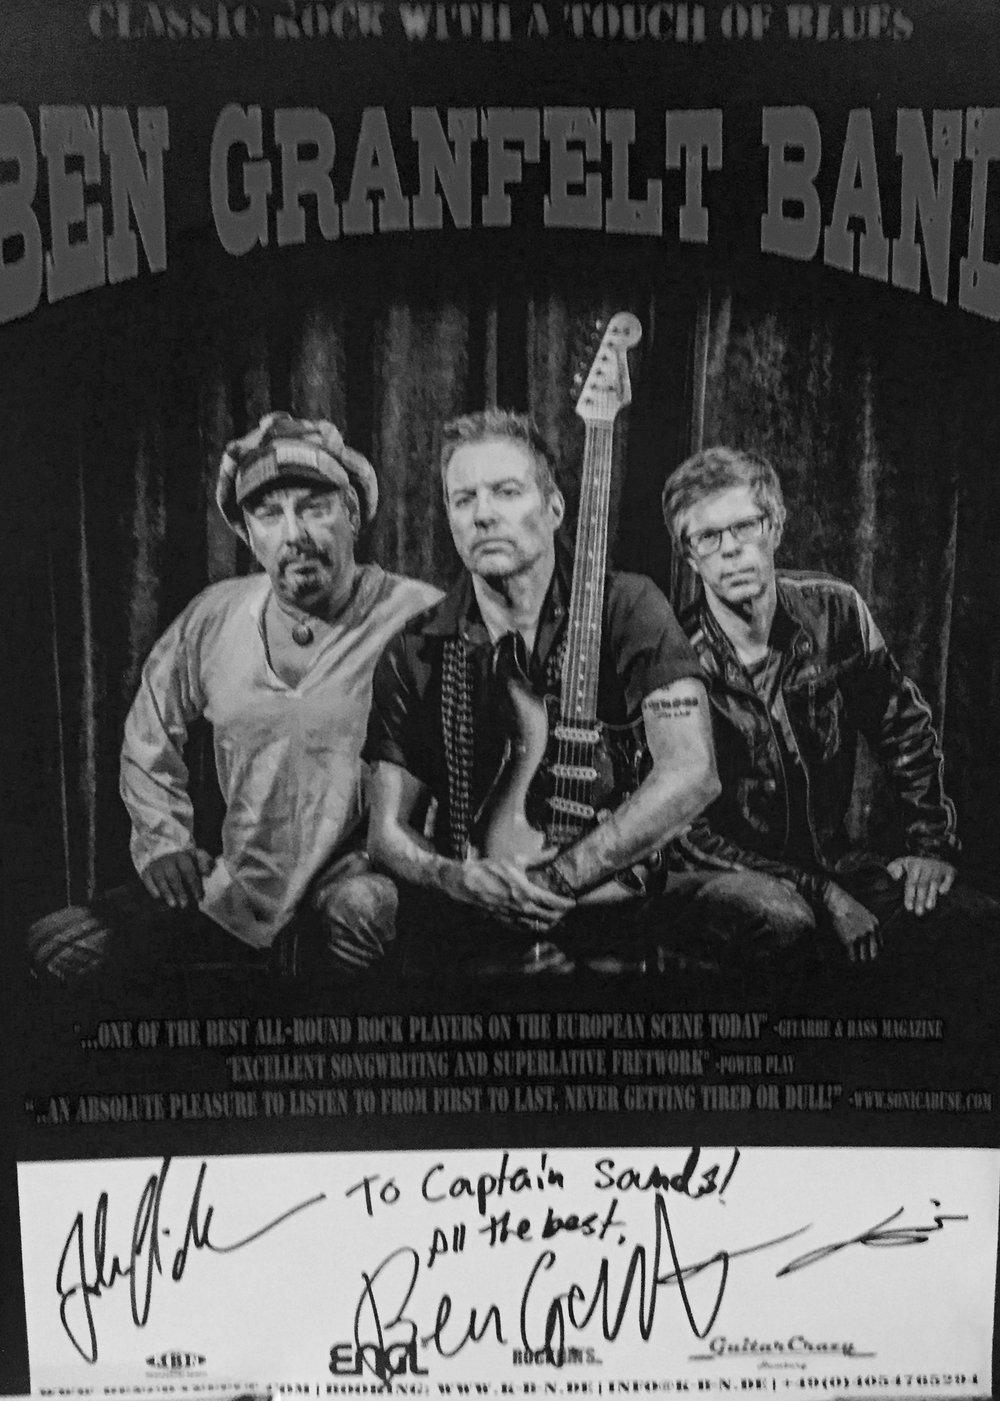 Ben Granfelt Band